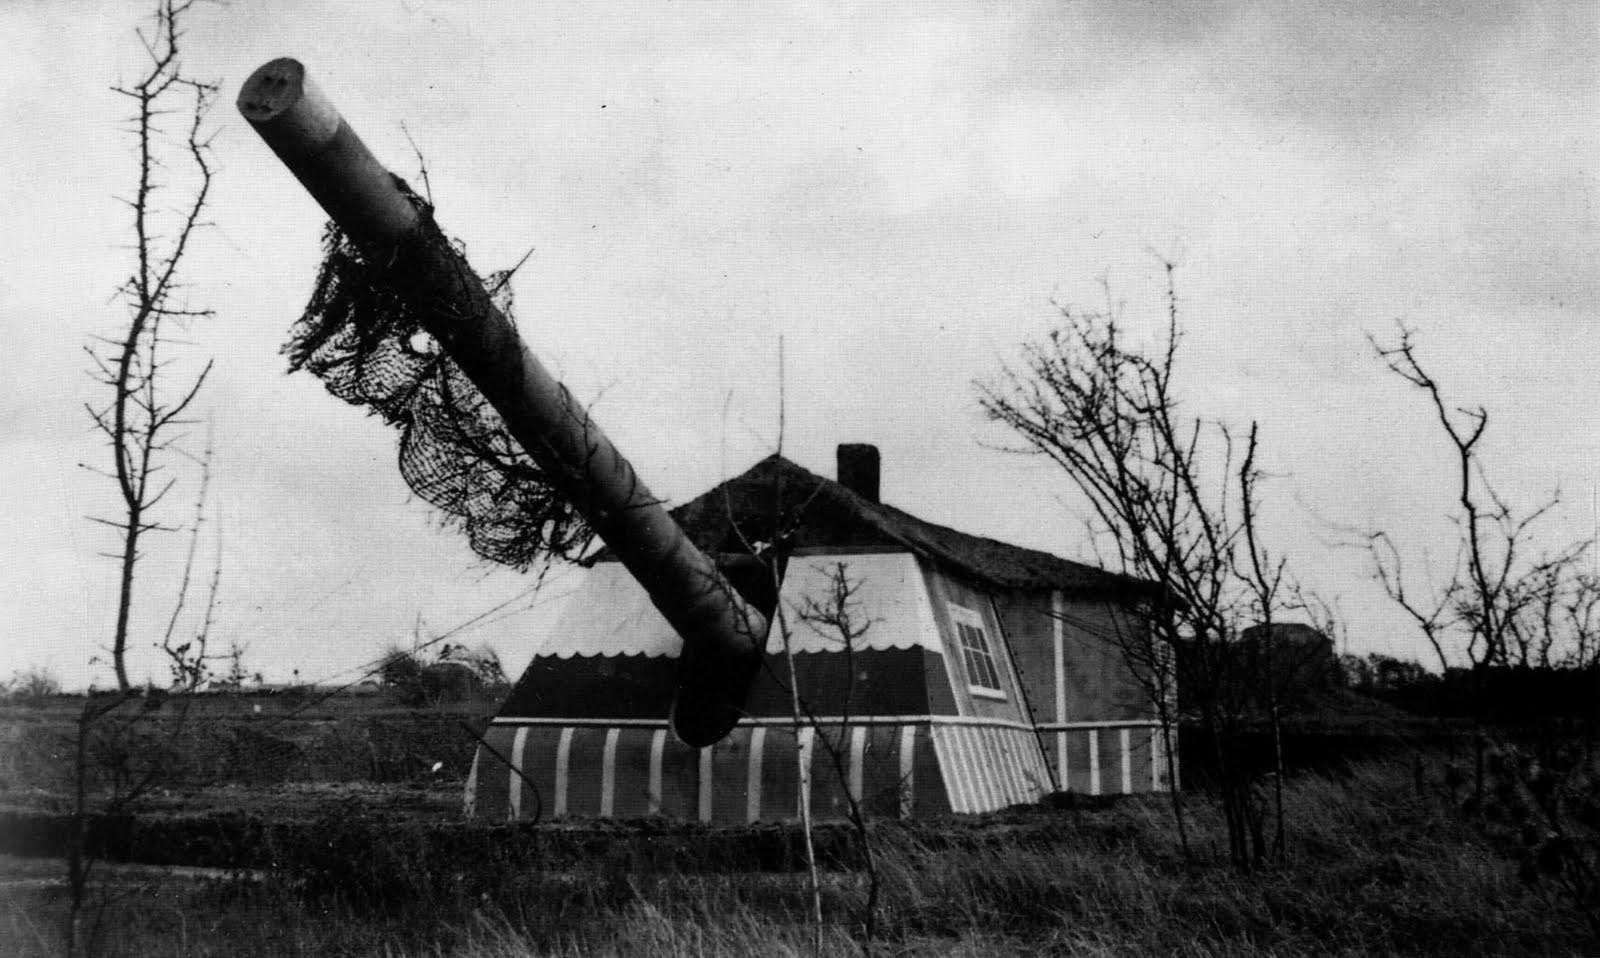 Batterie Mirus, Guernsey, ca. 1942